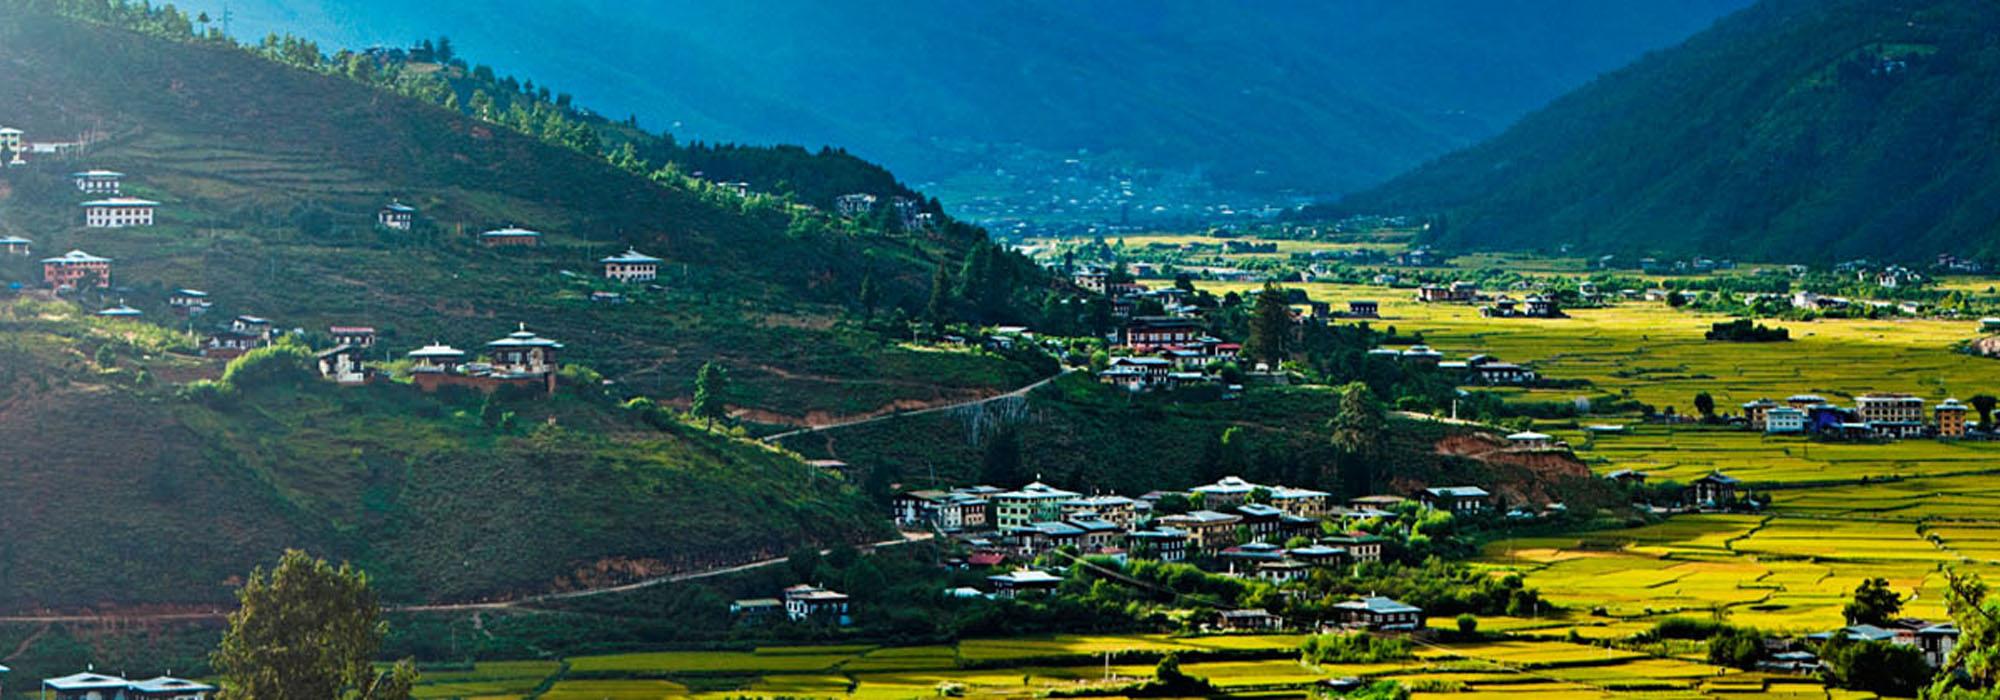 Landscape of Bhutan